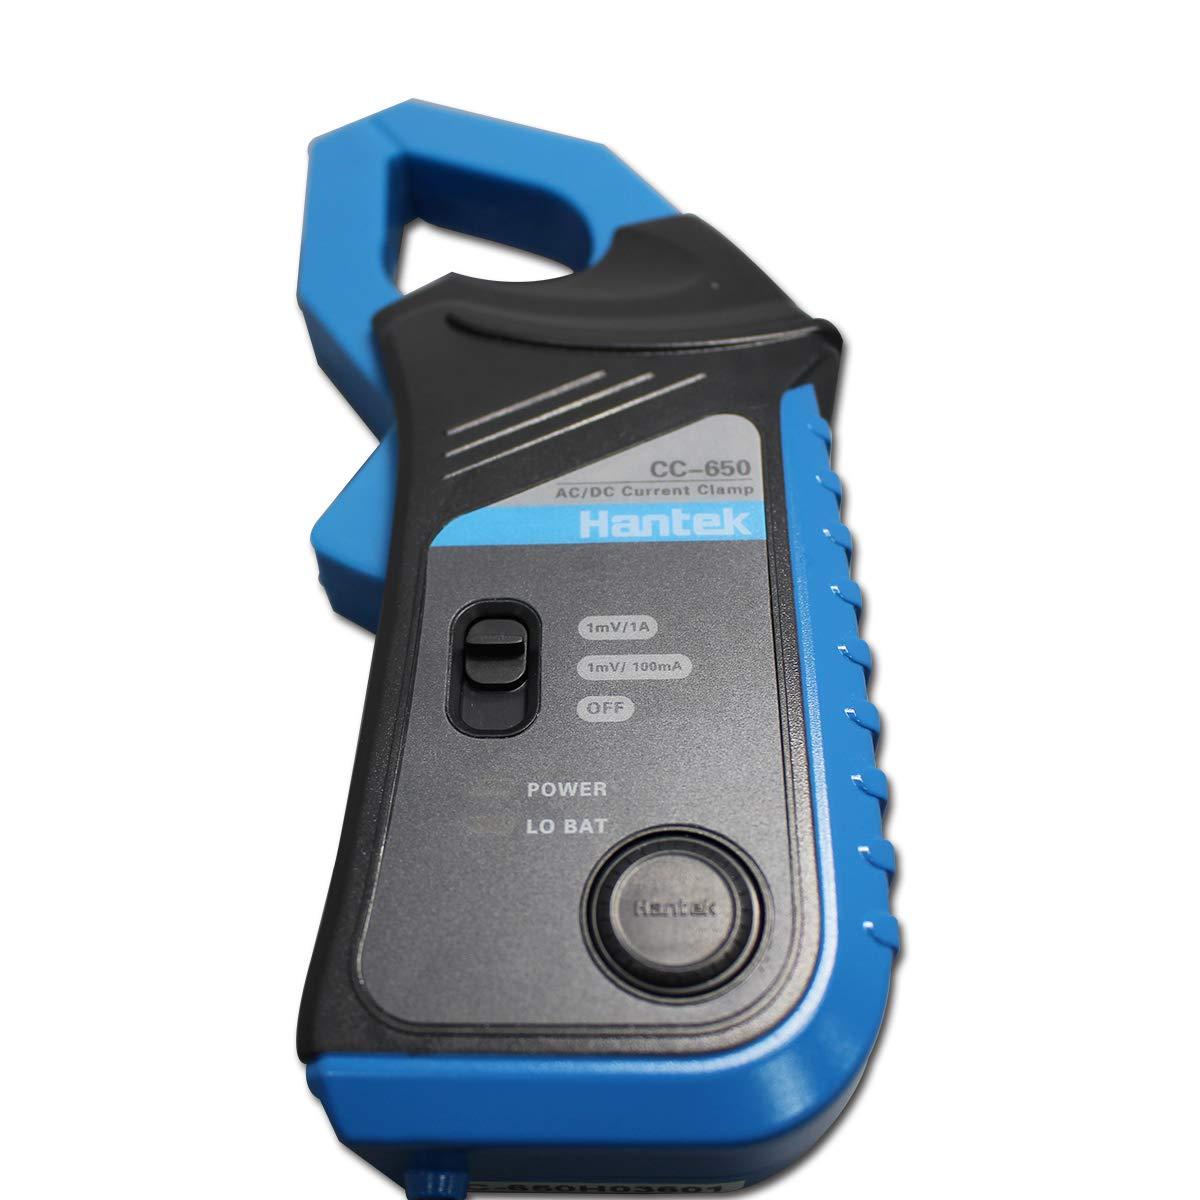 Hantek 650A AC//DC Current Clamp for Hantek/&Other Makes Auto Oscilloscopes and DMMs,CC 650 BNC Plug